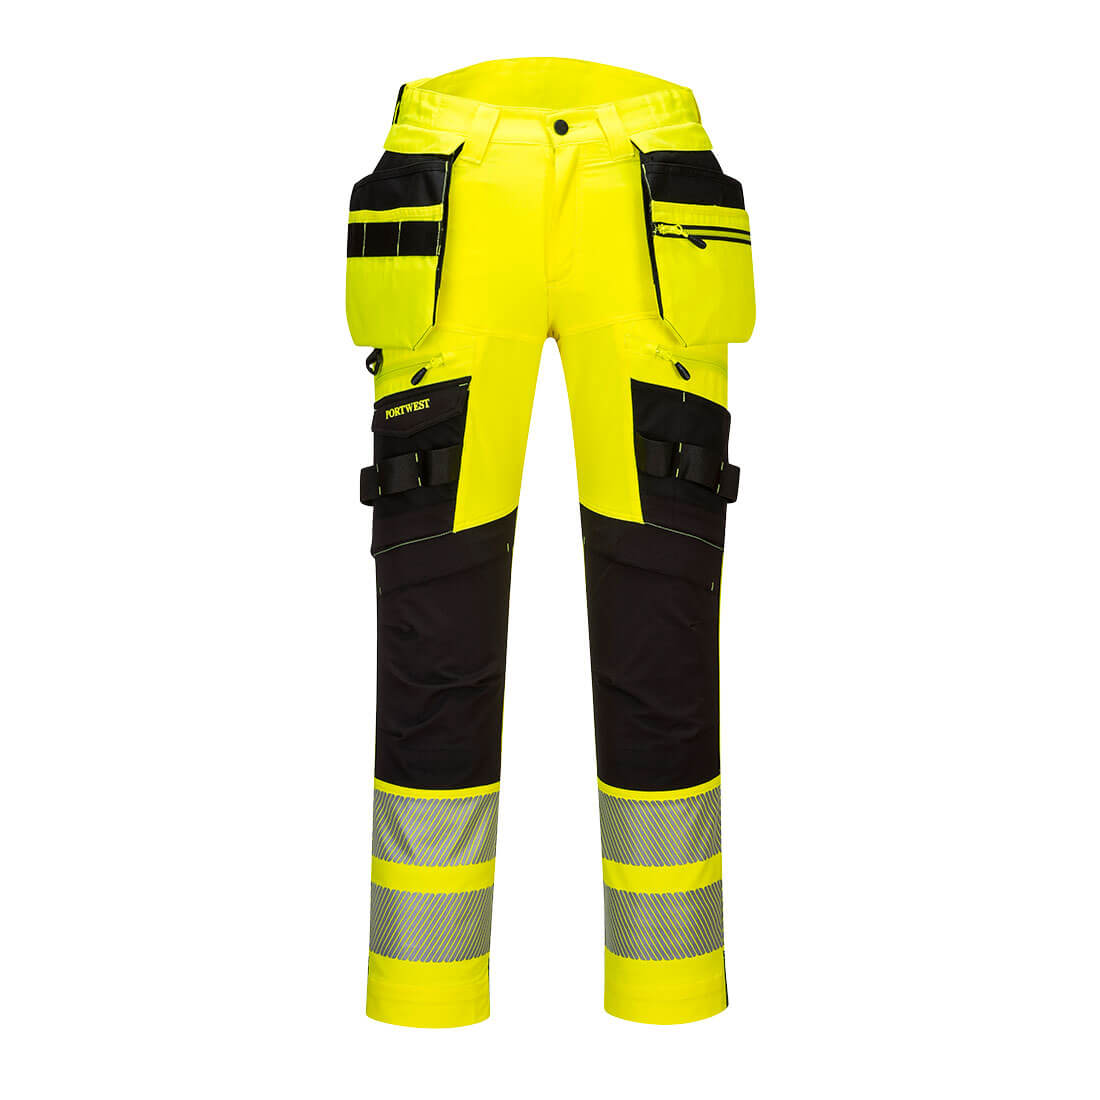 DX4 Hi-Vis Holster Trousers Yellow/Black 44 R